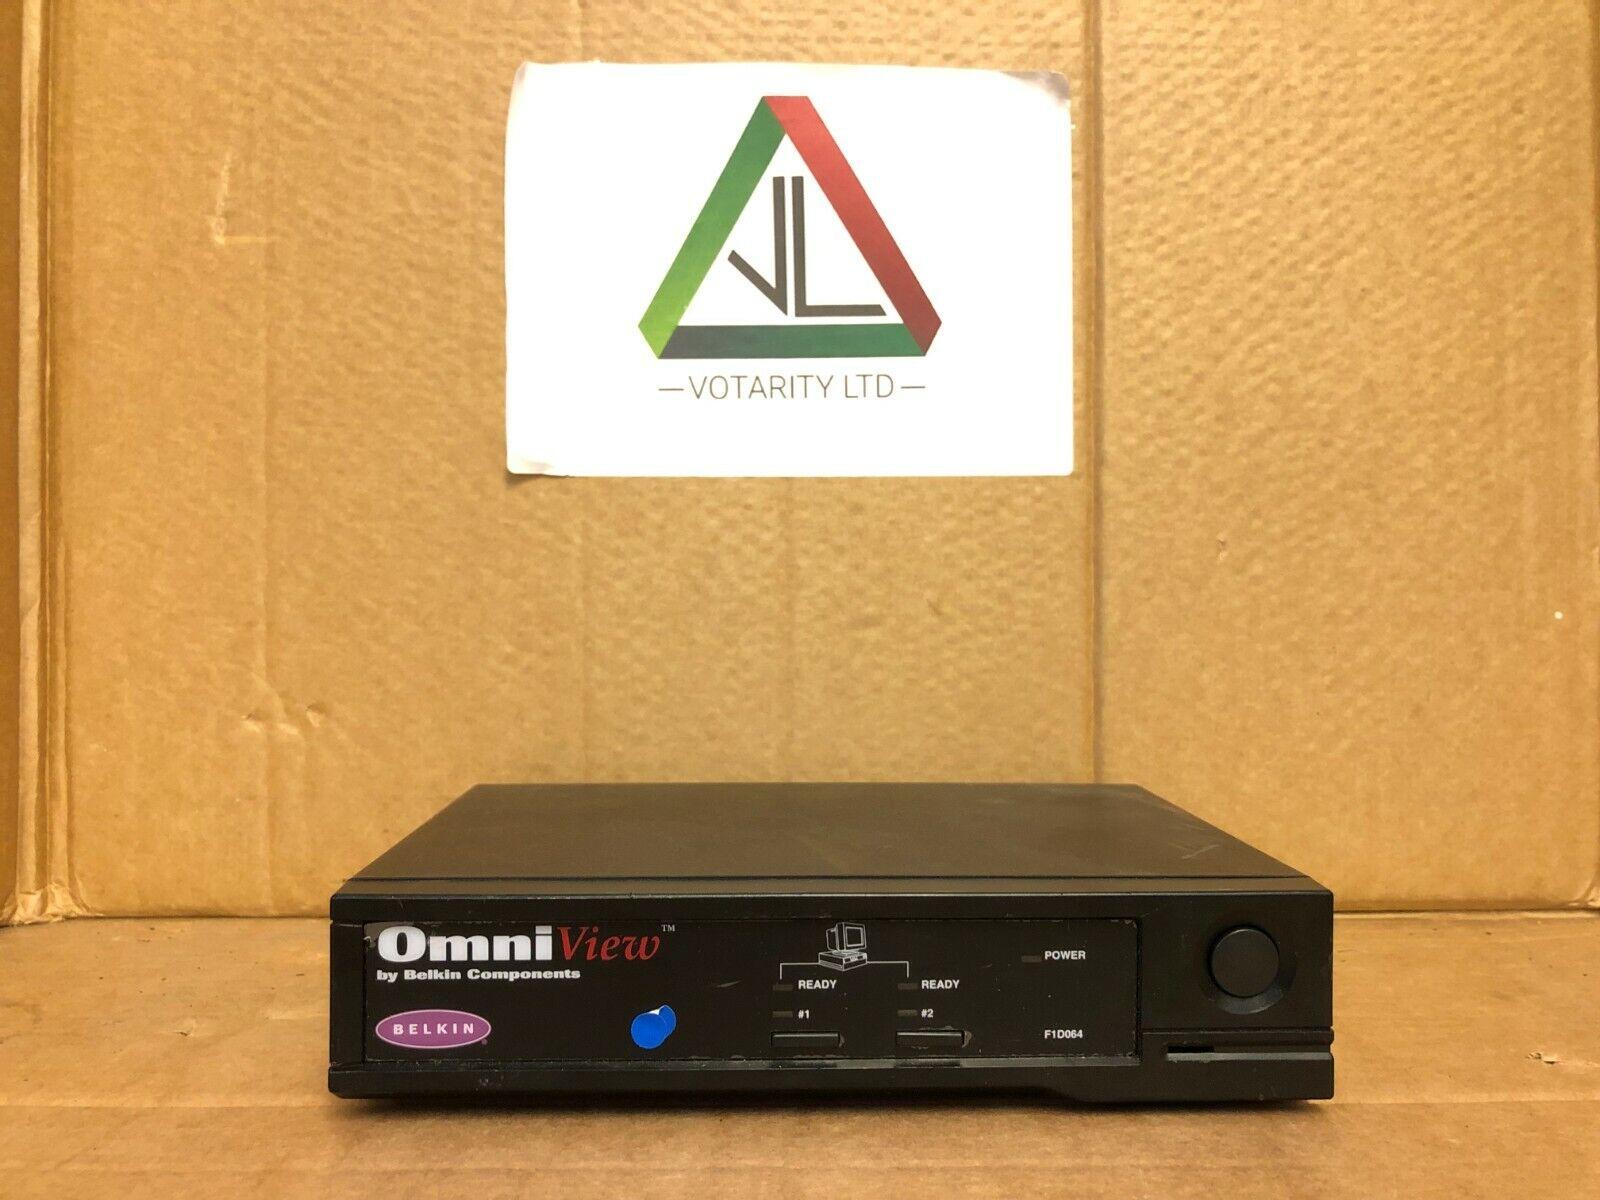 OmniView by Belkin Component KVM + No PSU (Keyboard, Video & Mouse) (Inc VAT)